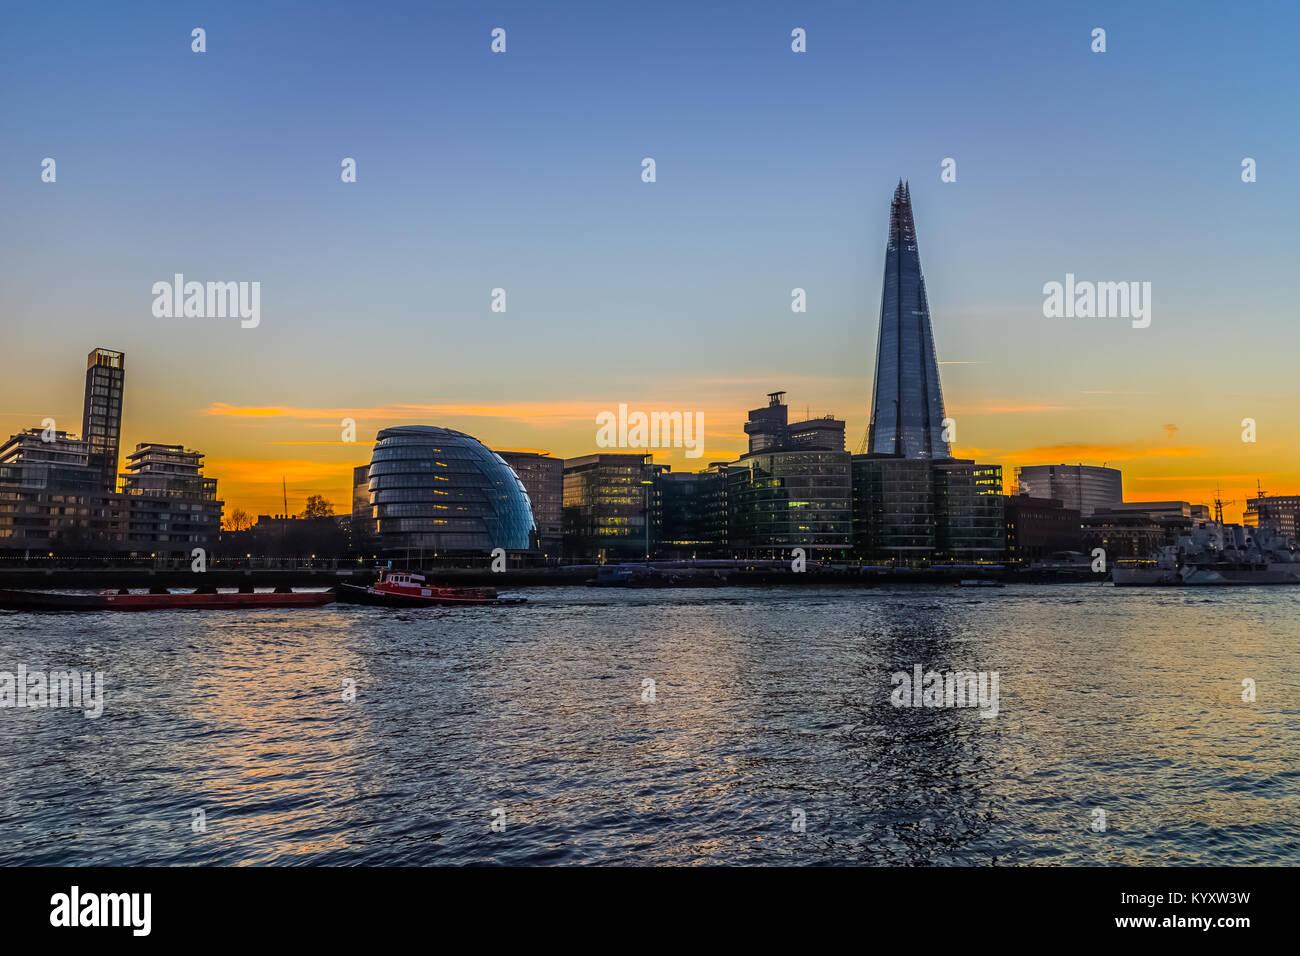 City Hall, Embankment / River Thames, London Stock Photo